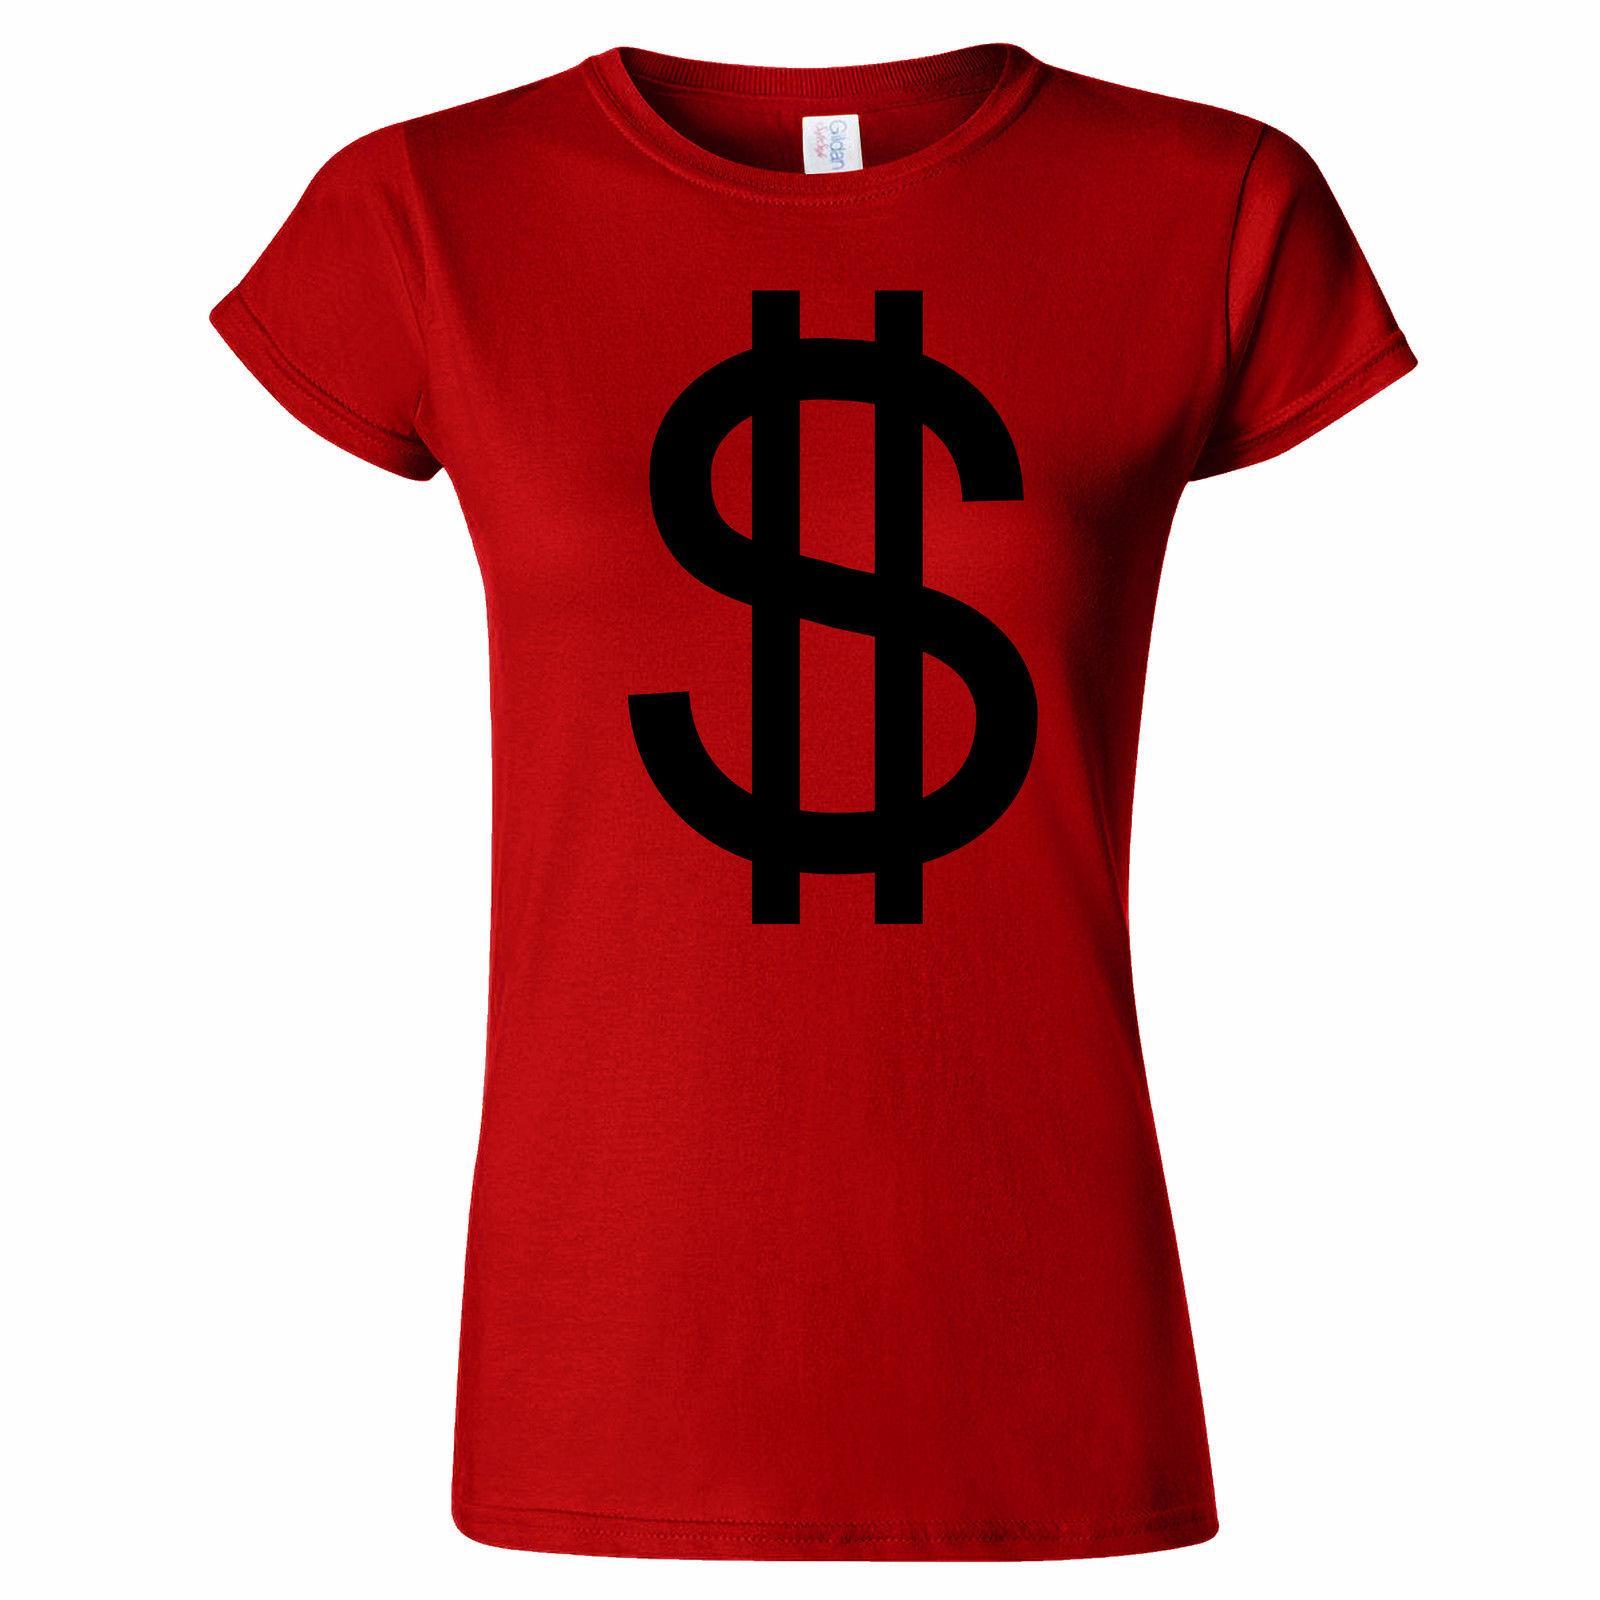 LARGE DOLLAR SIGN WOMENS T SHIRT DESIGN MONEY AMERICA US CANADIAN CASH  AUSTRALIA